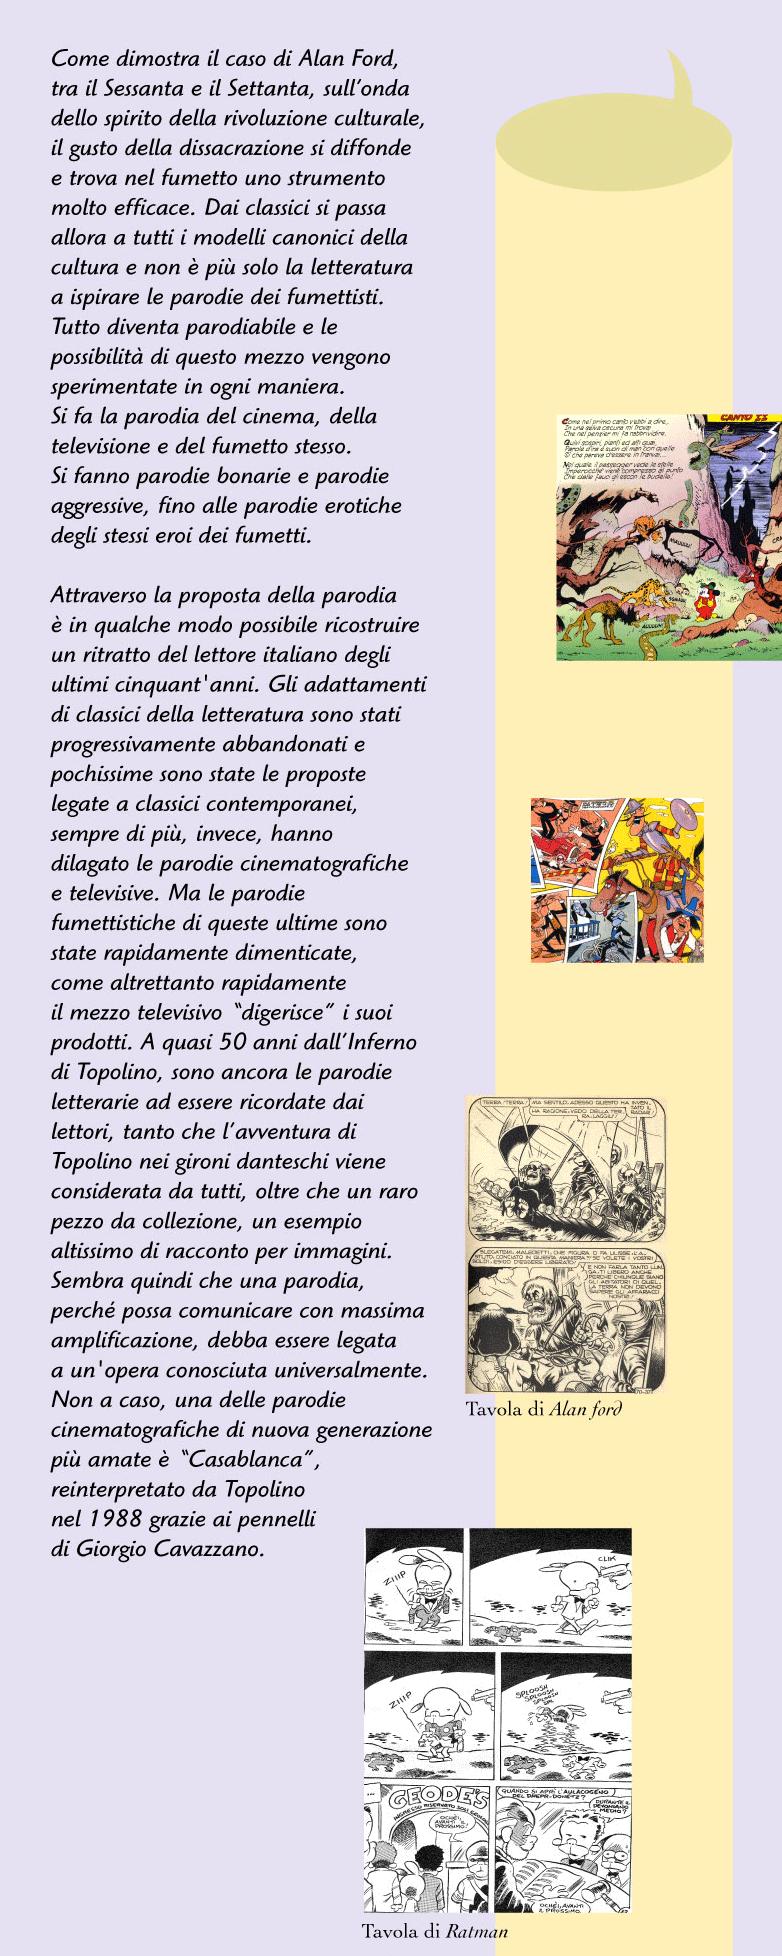 Pannello 4